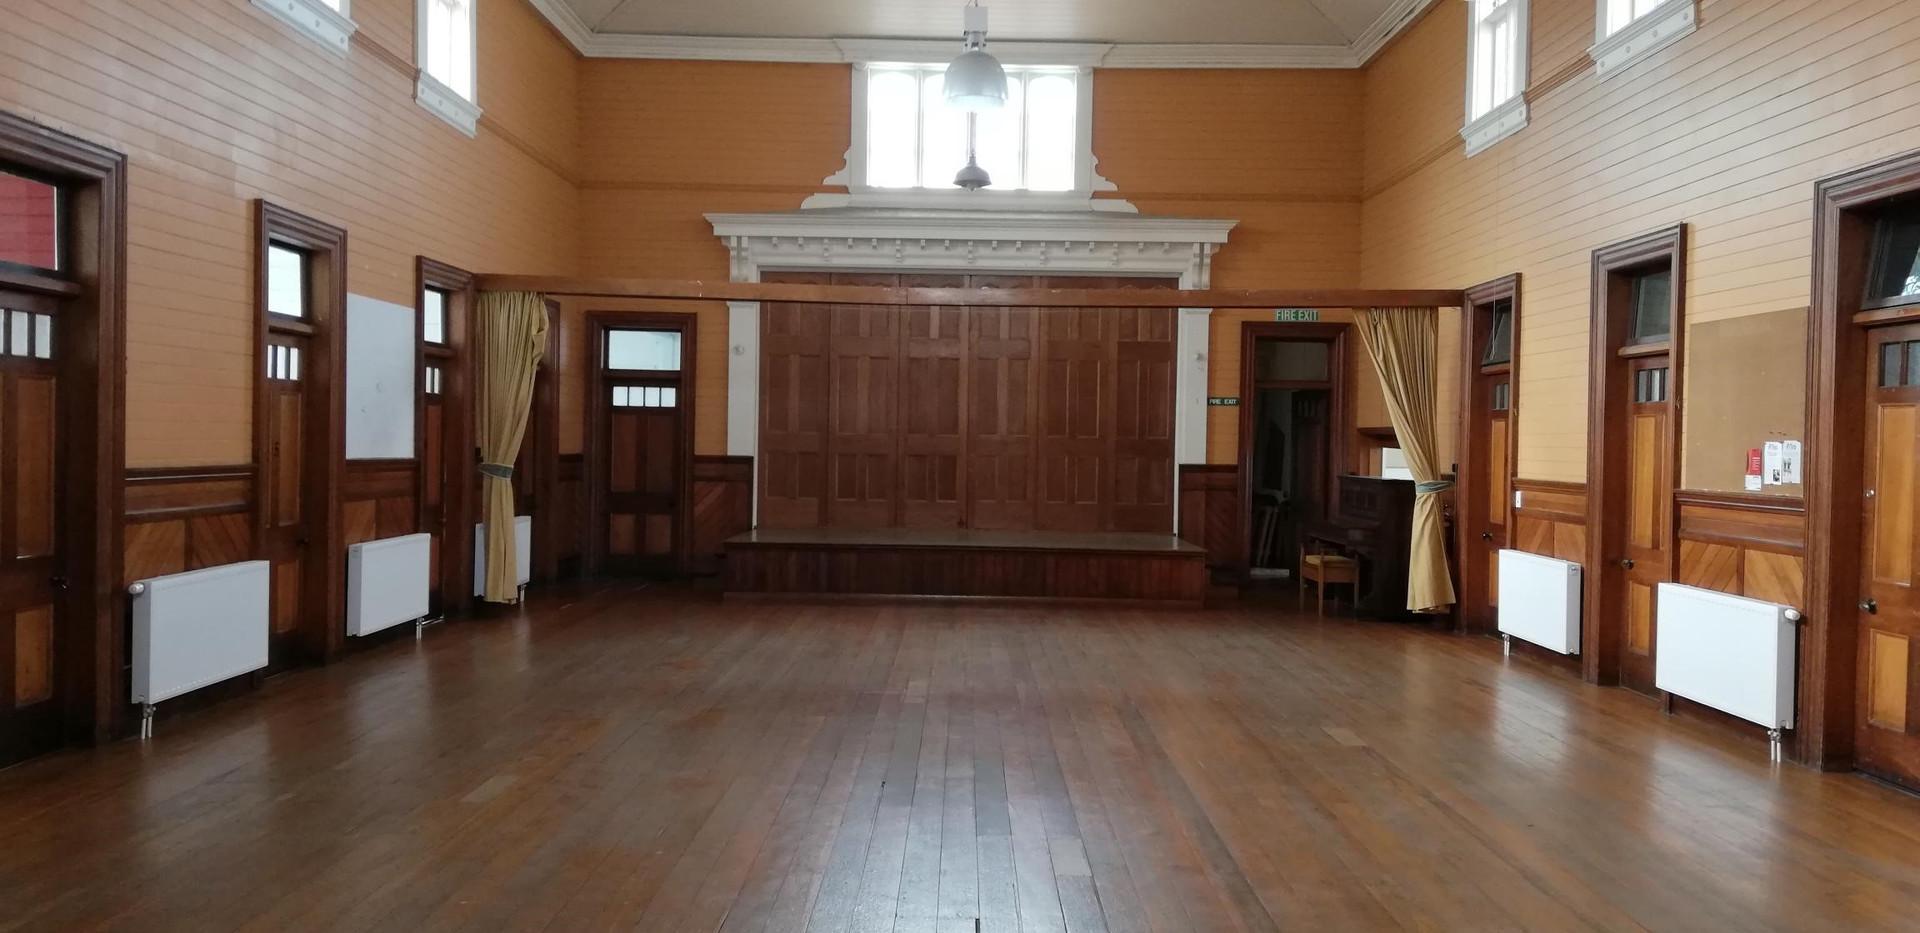 Old St John's Hall